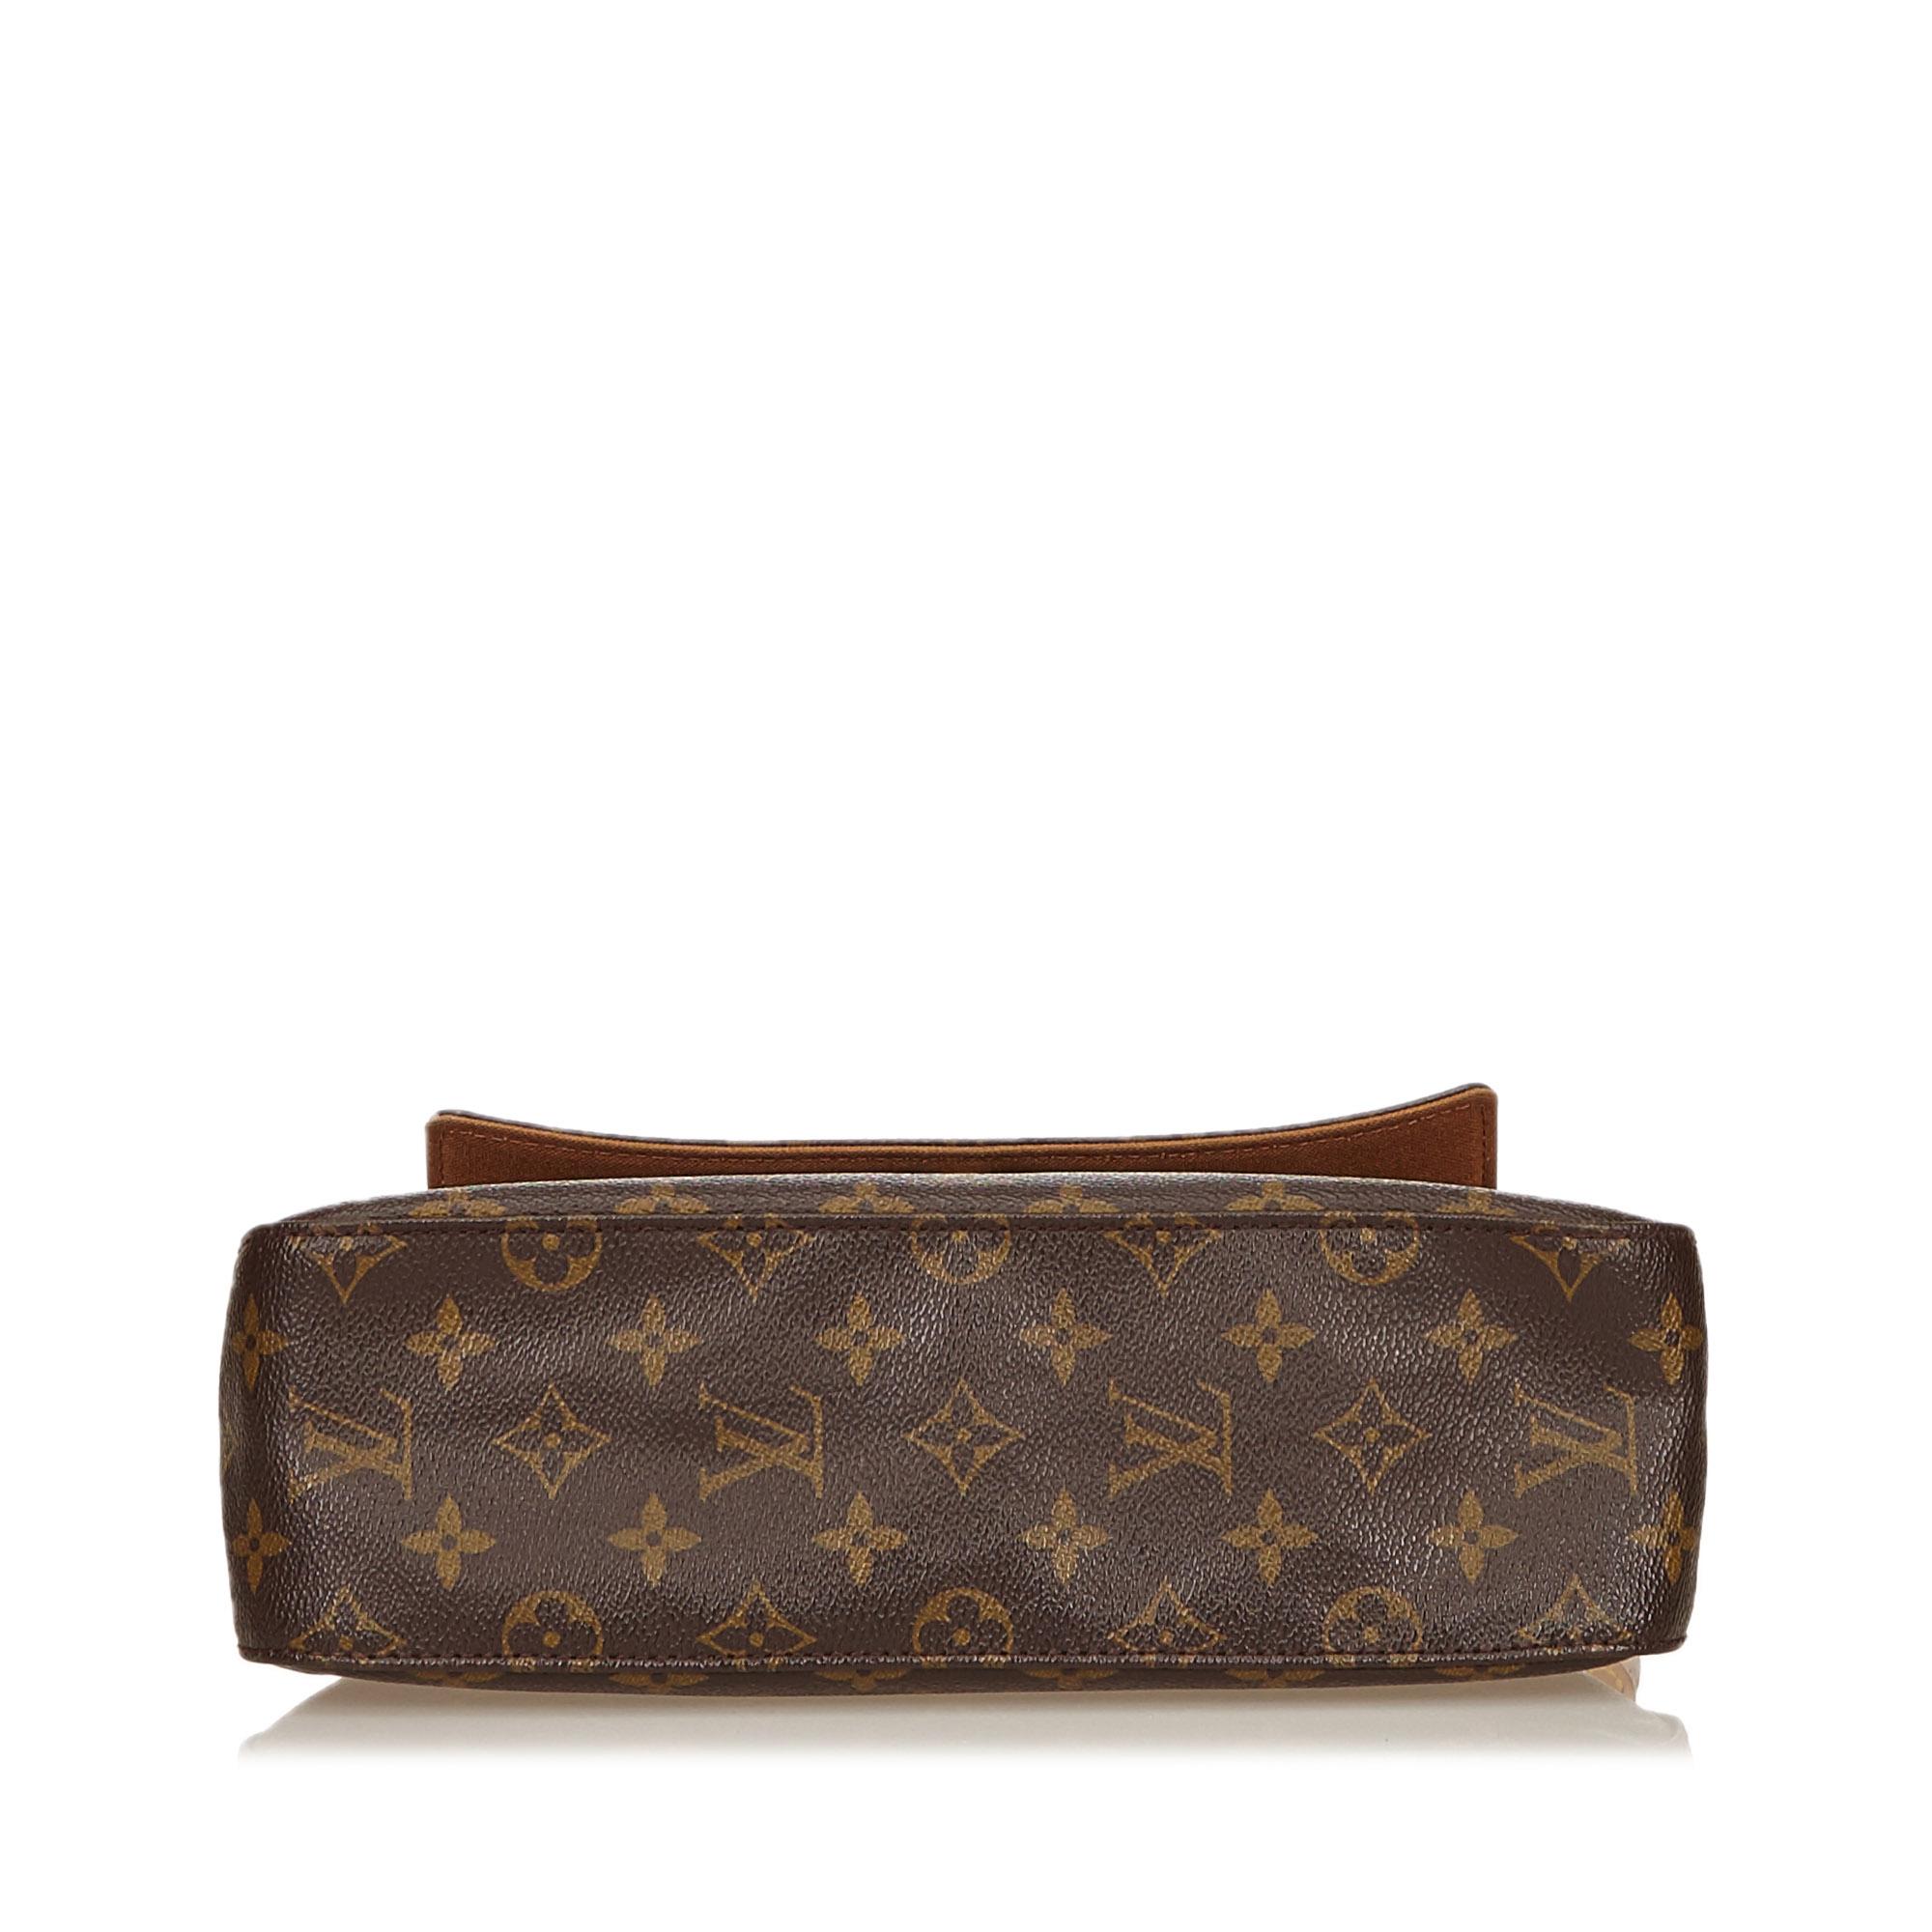 Louis Vuitton Monogram Canvas Mini Looping Bag